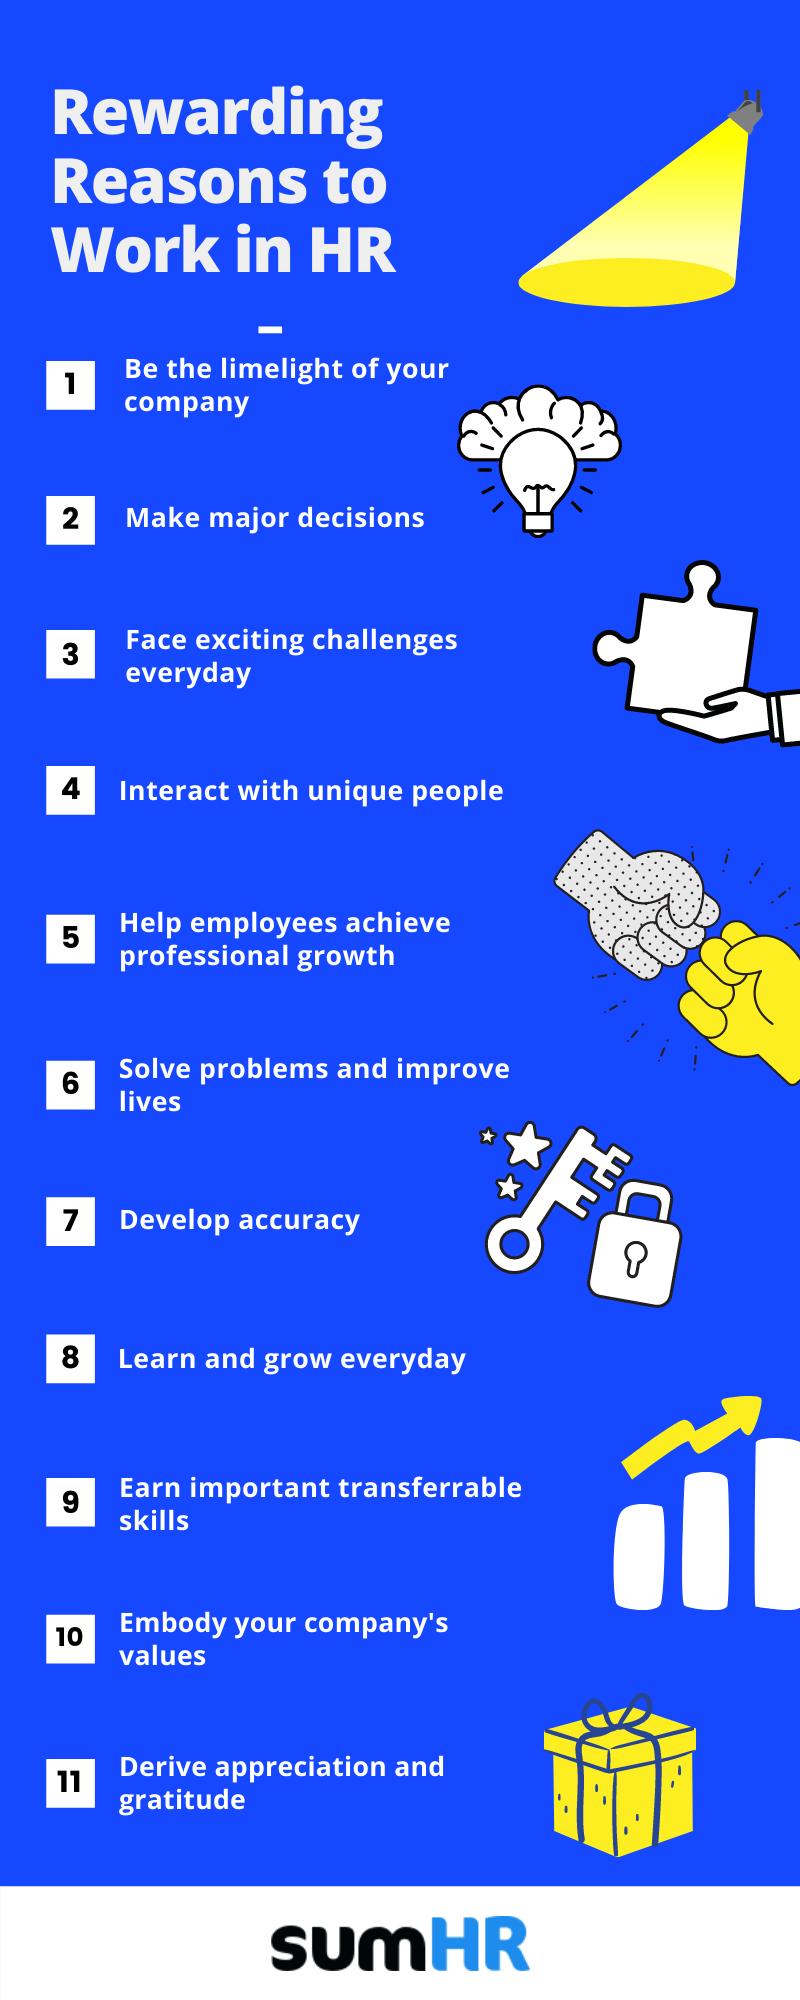 rewarding reasons to work in HR